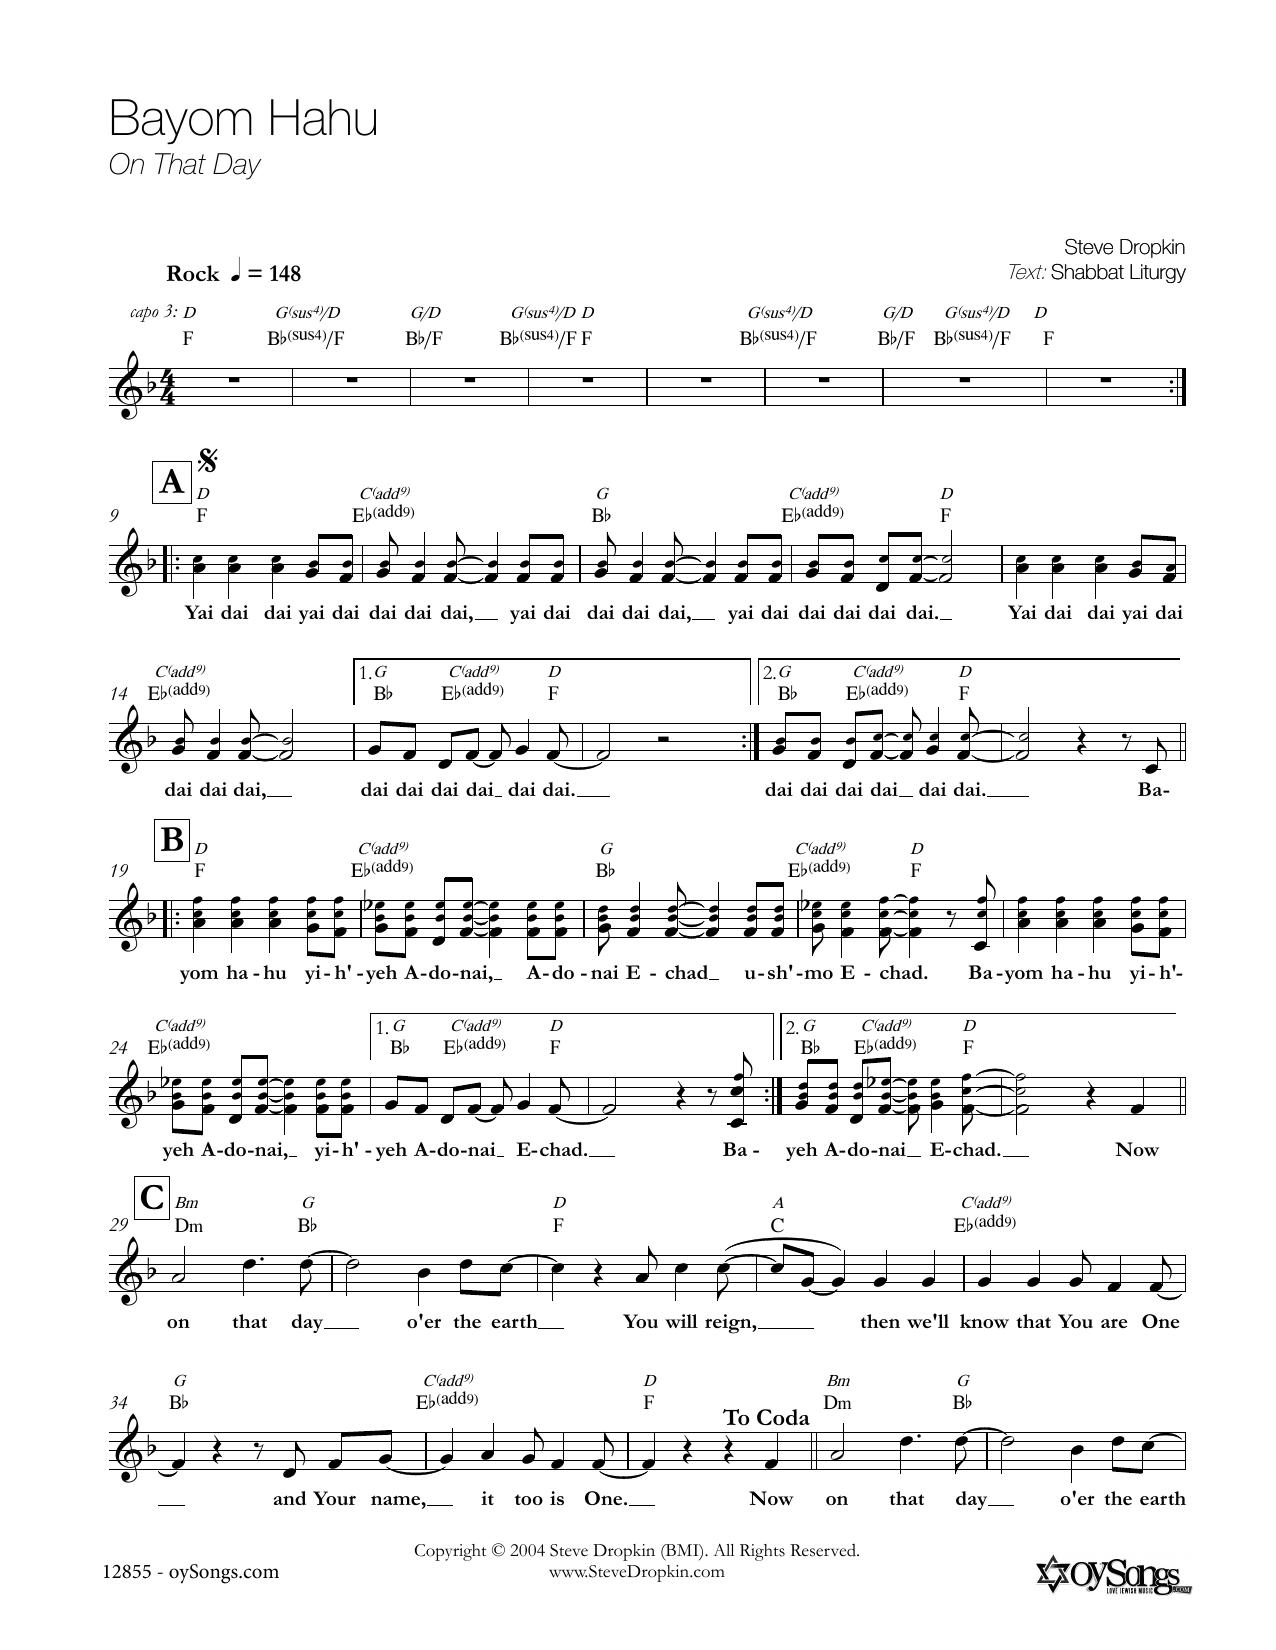 Bayom Hahu Sheet Music